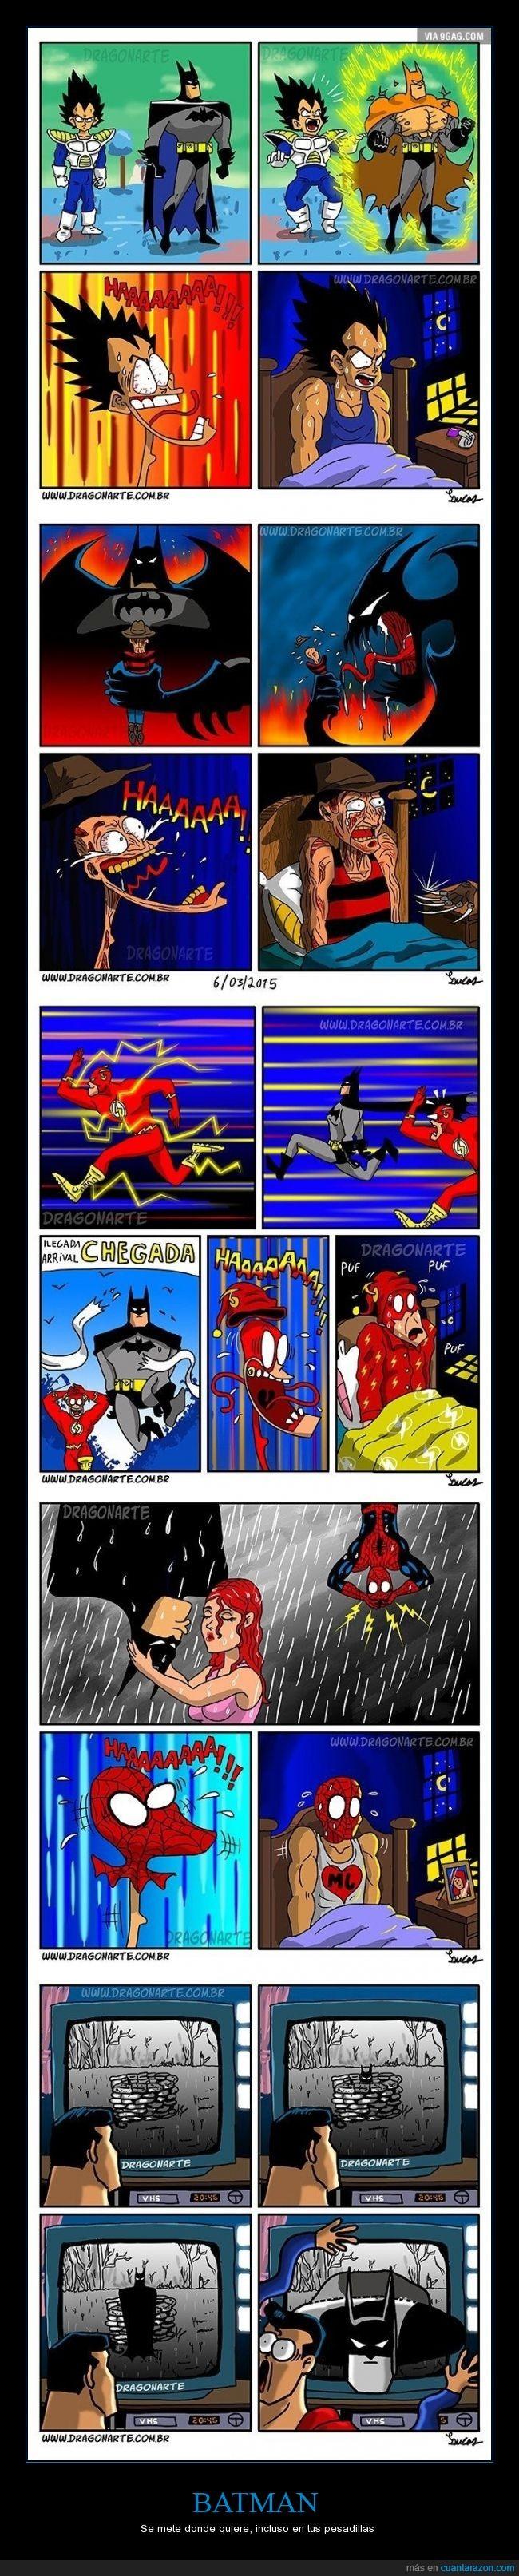 batman,colar,flash,miedo,pesadillas,sueño,superman,the ring,vegeta